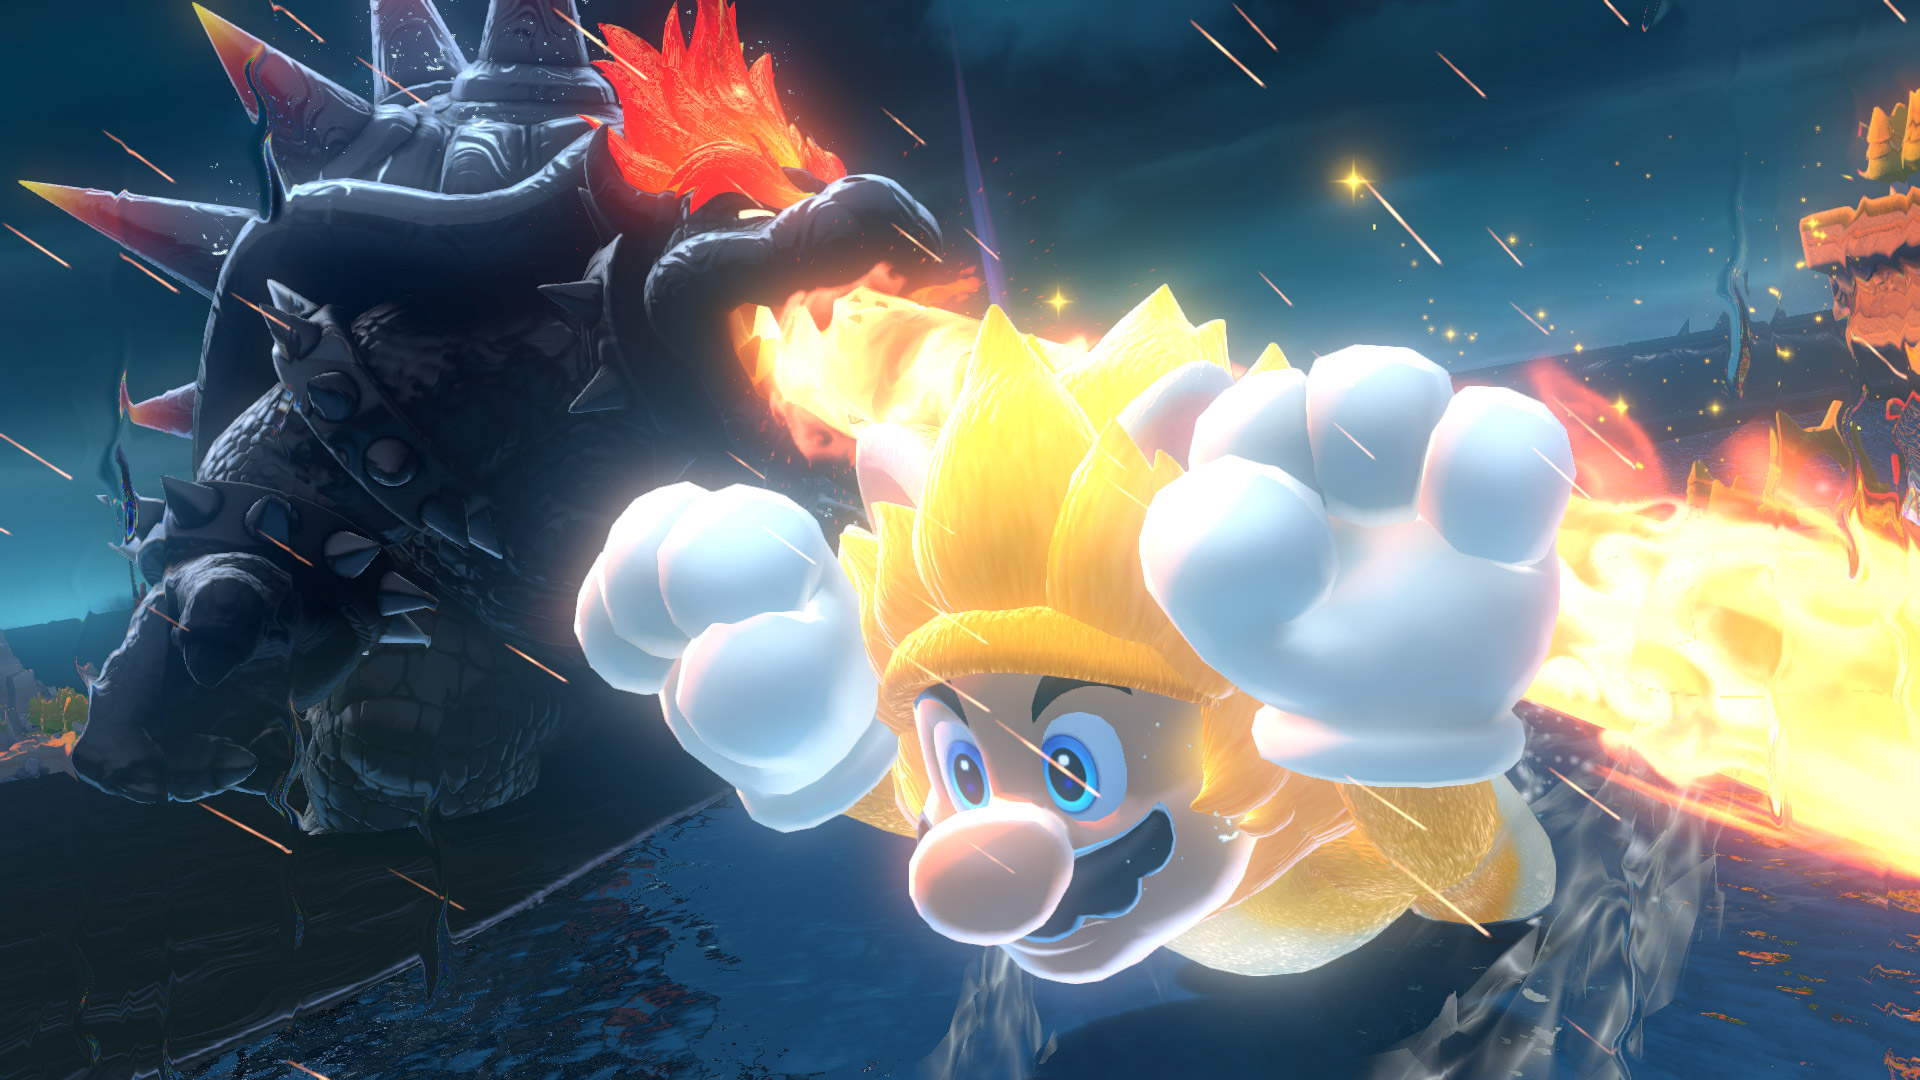 Super Mario 3D World 1520221 1